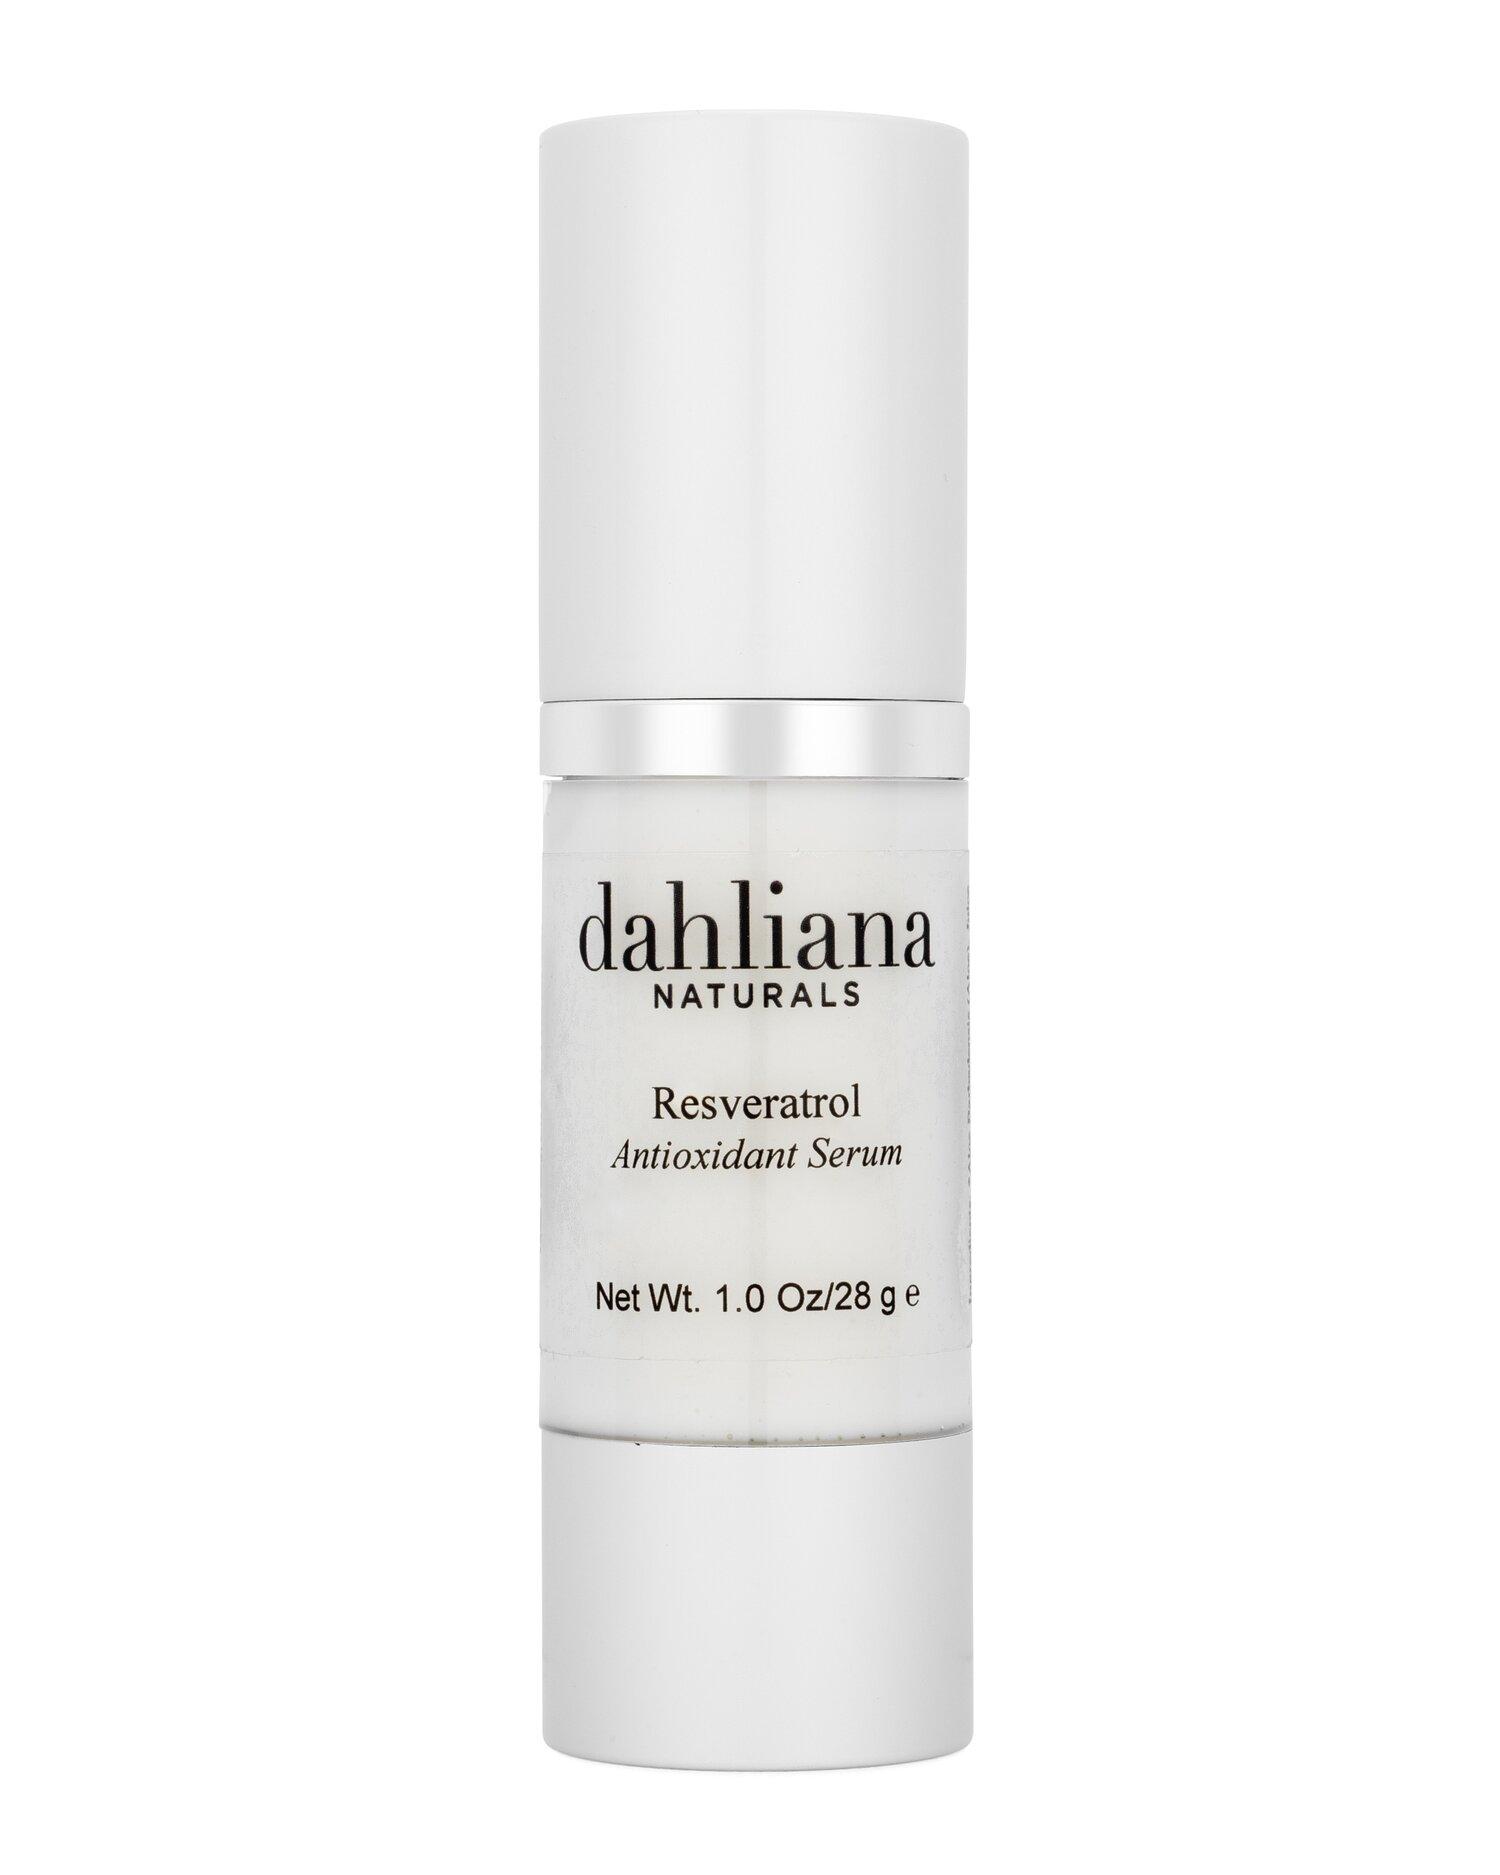 Resveratrol Antioxidant Serum Dahliana Award Winning Natural Skin Care